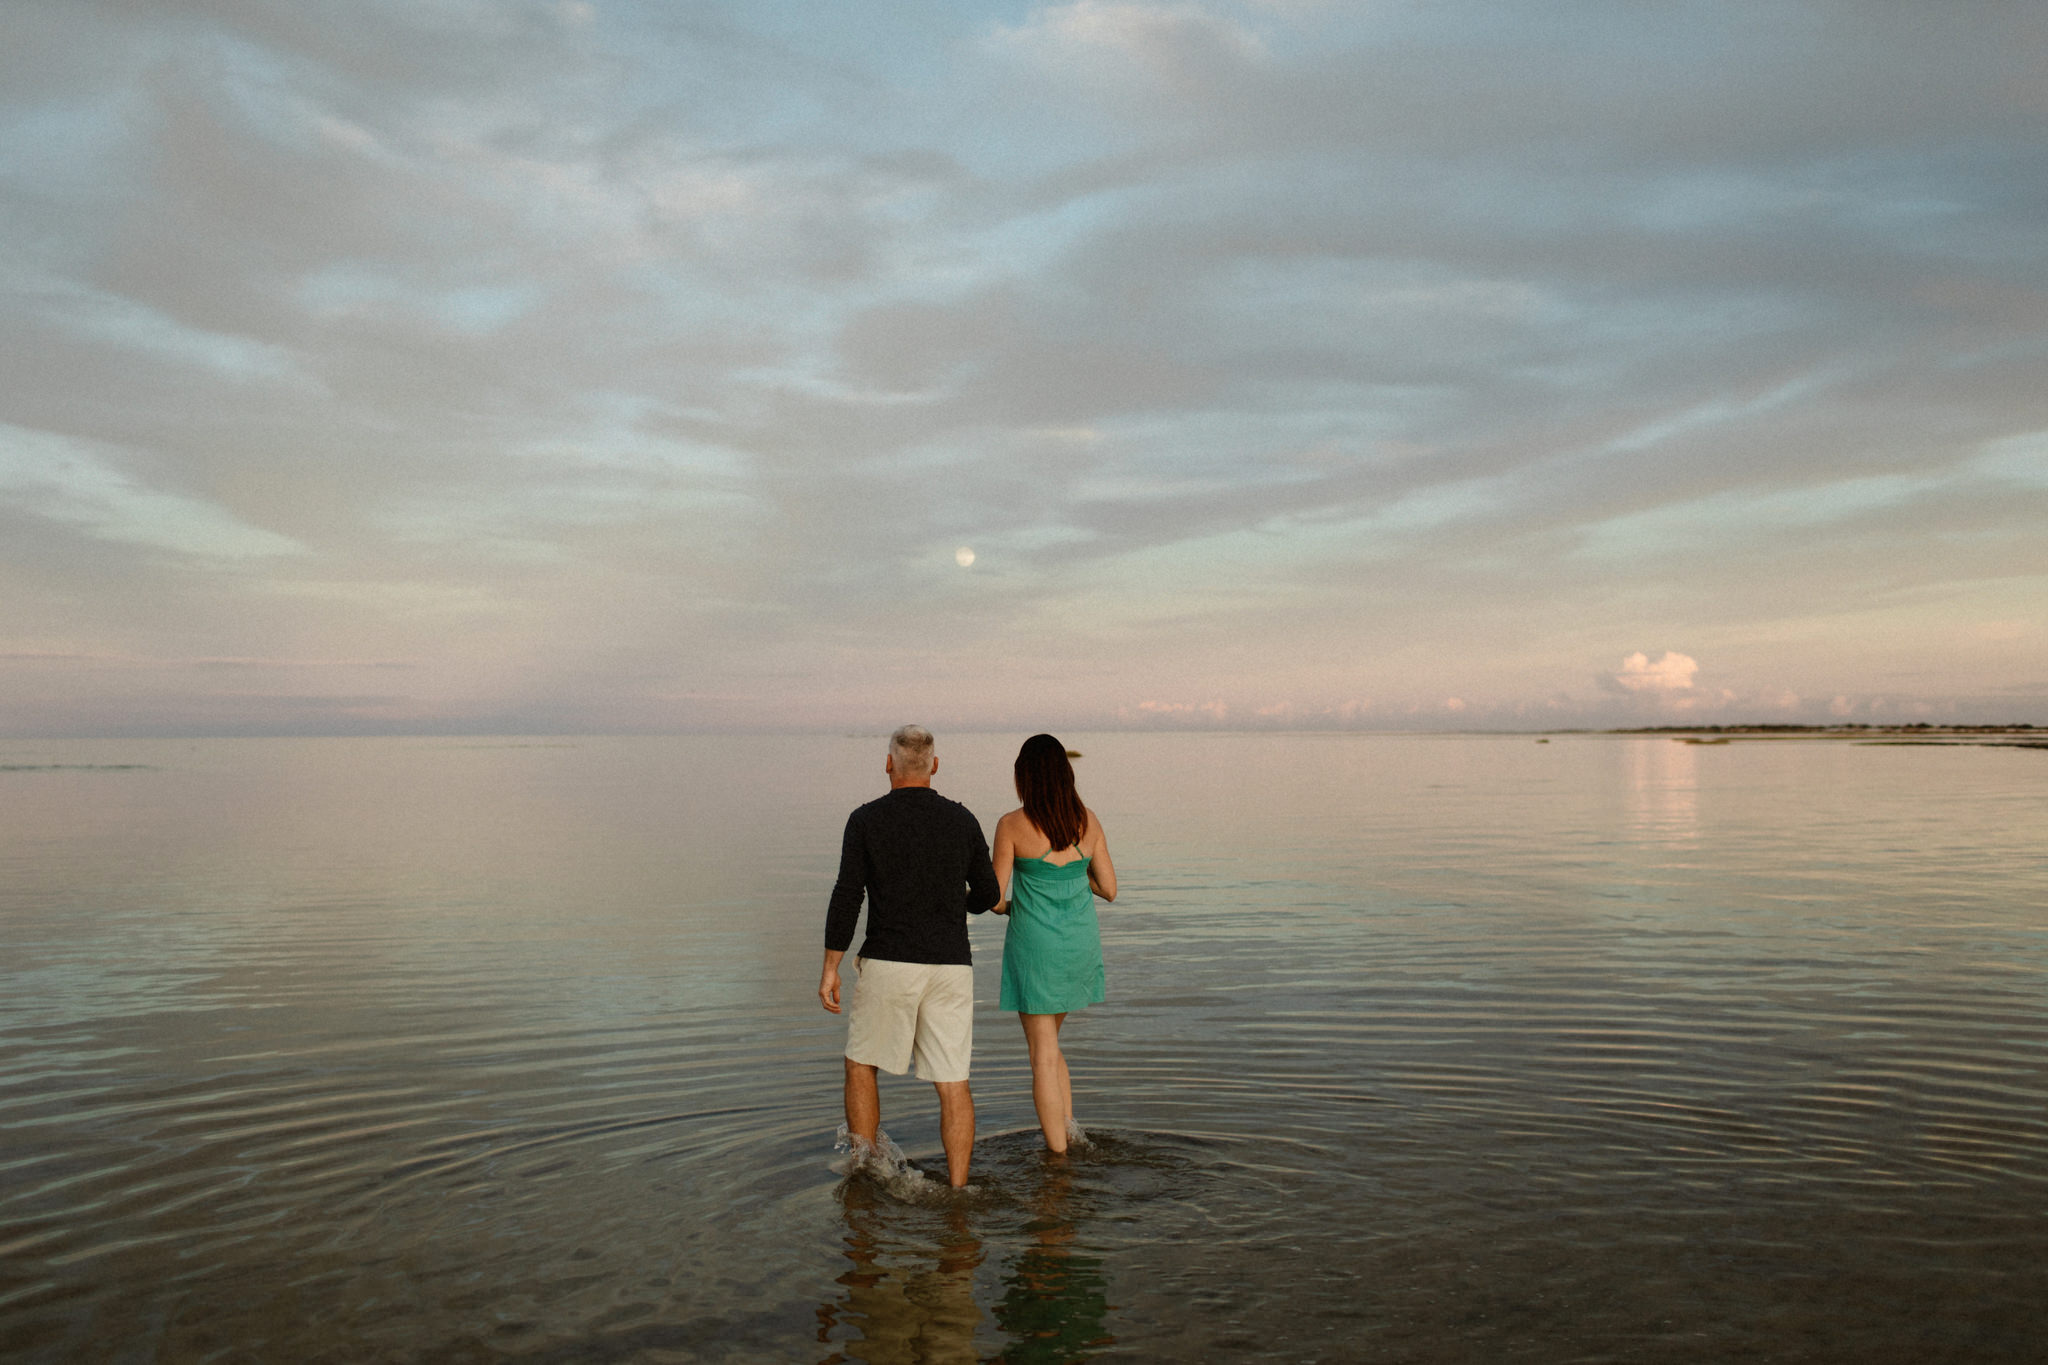 Cedar Island Outer Banks Engagement Photos-Amanda&Ted-websize-157.jpg